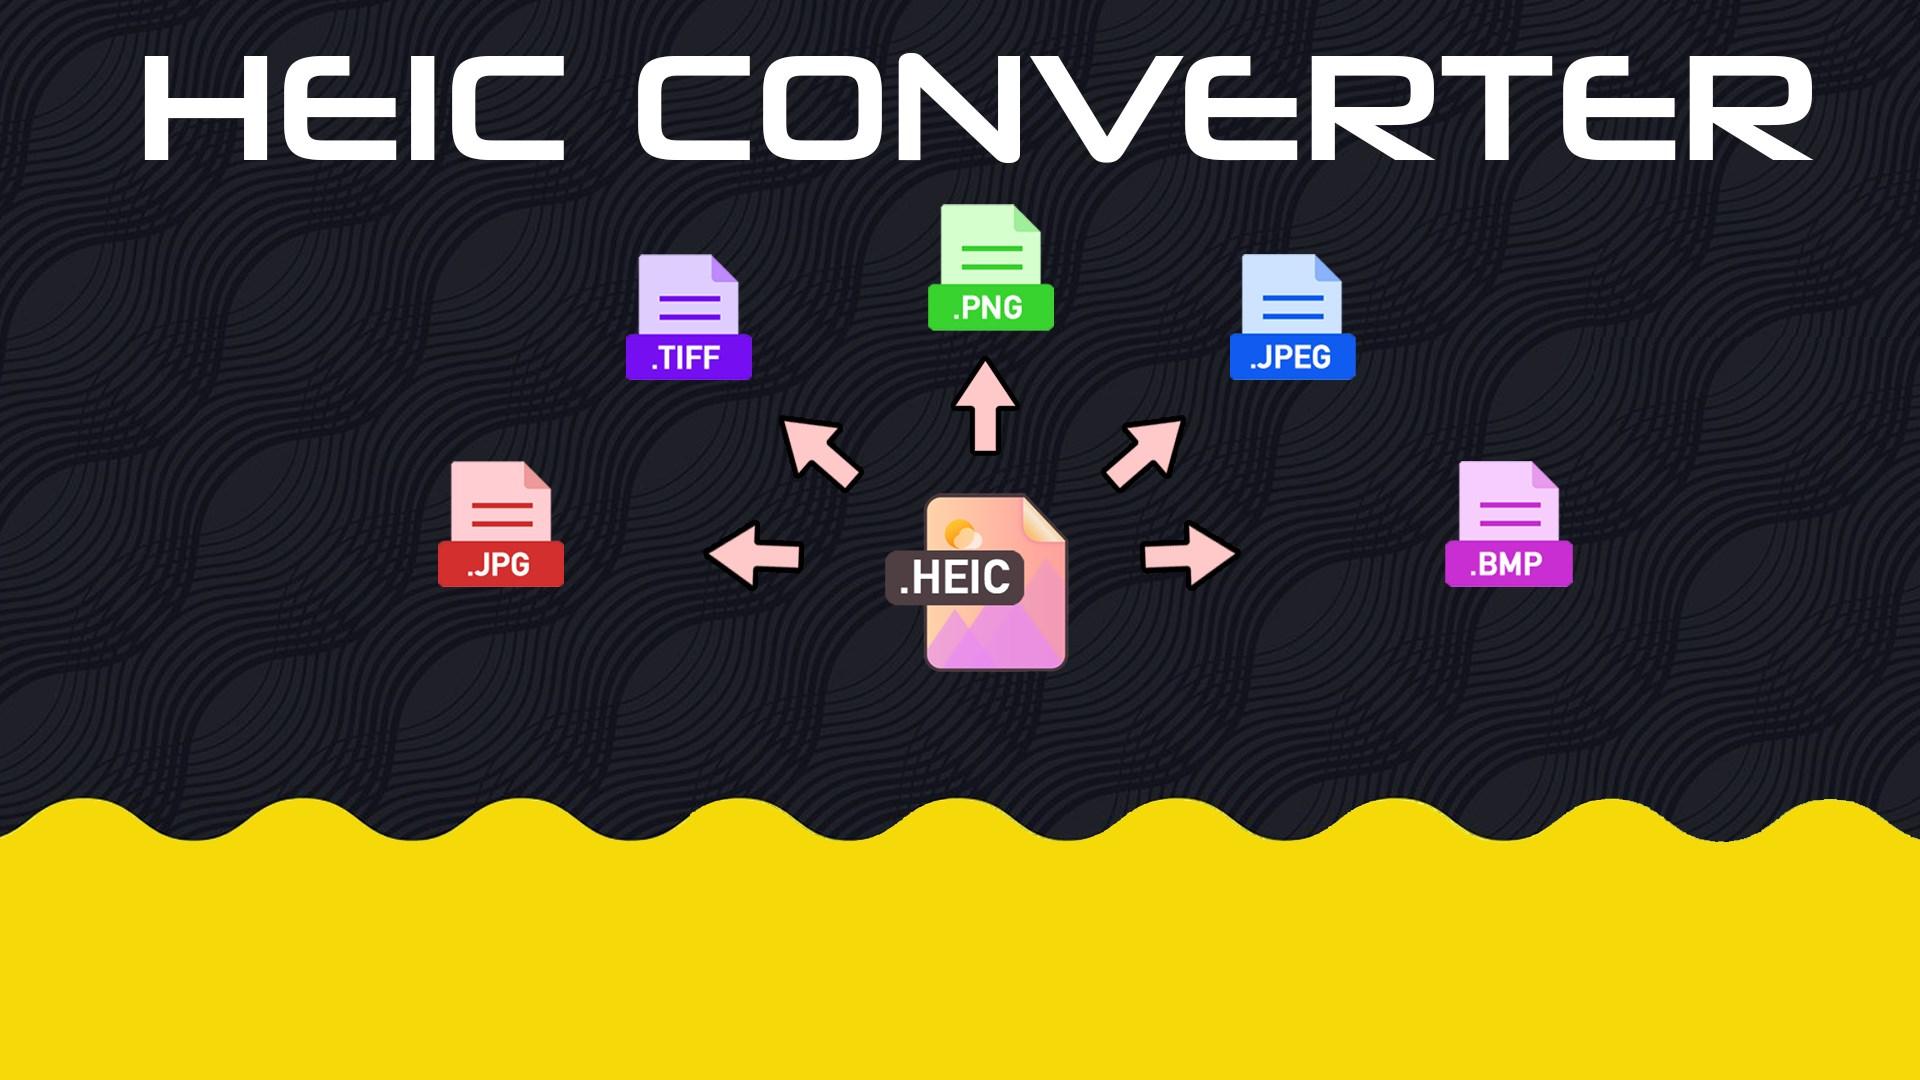 Buy HEIC Image Converter Master Tool - Microsoft Store